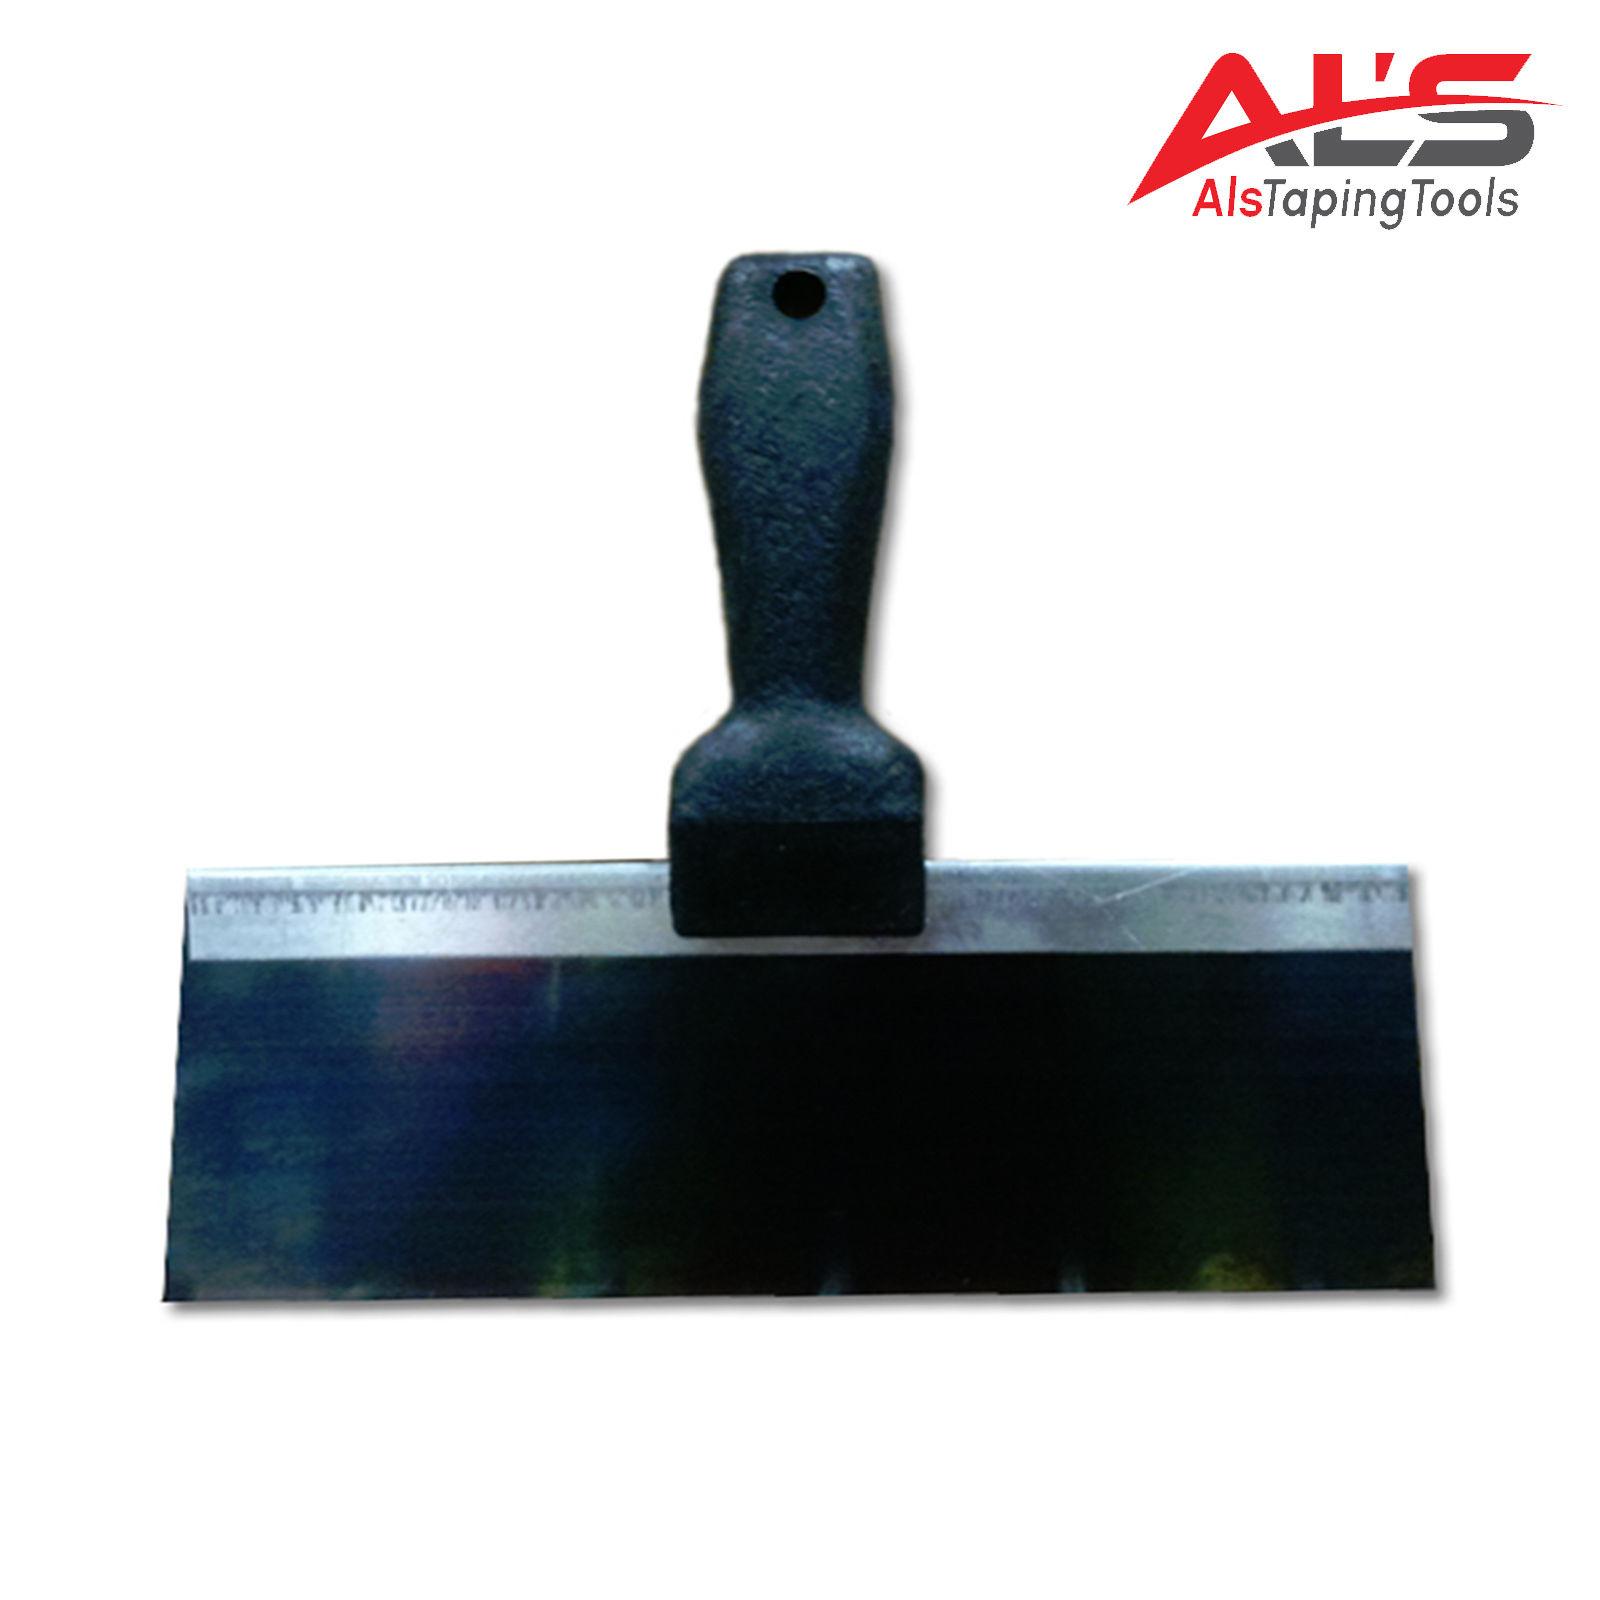 "BON 15-339 TAPING KNIFE - BLUE STEEL 8"" x 3"" - COMFORT GRIP HANDLE"